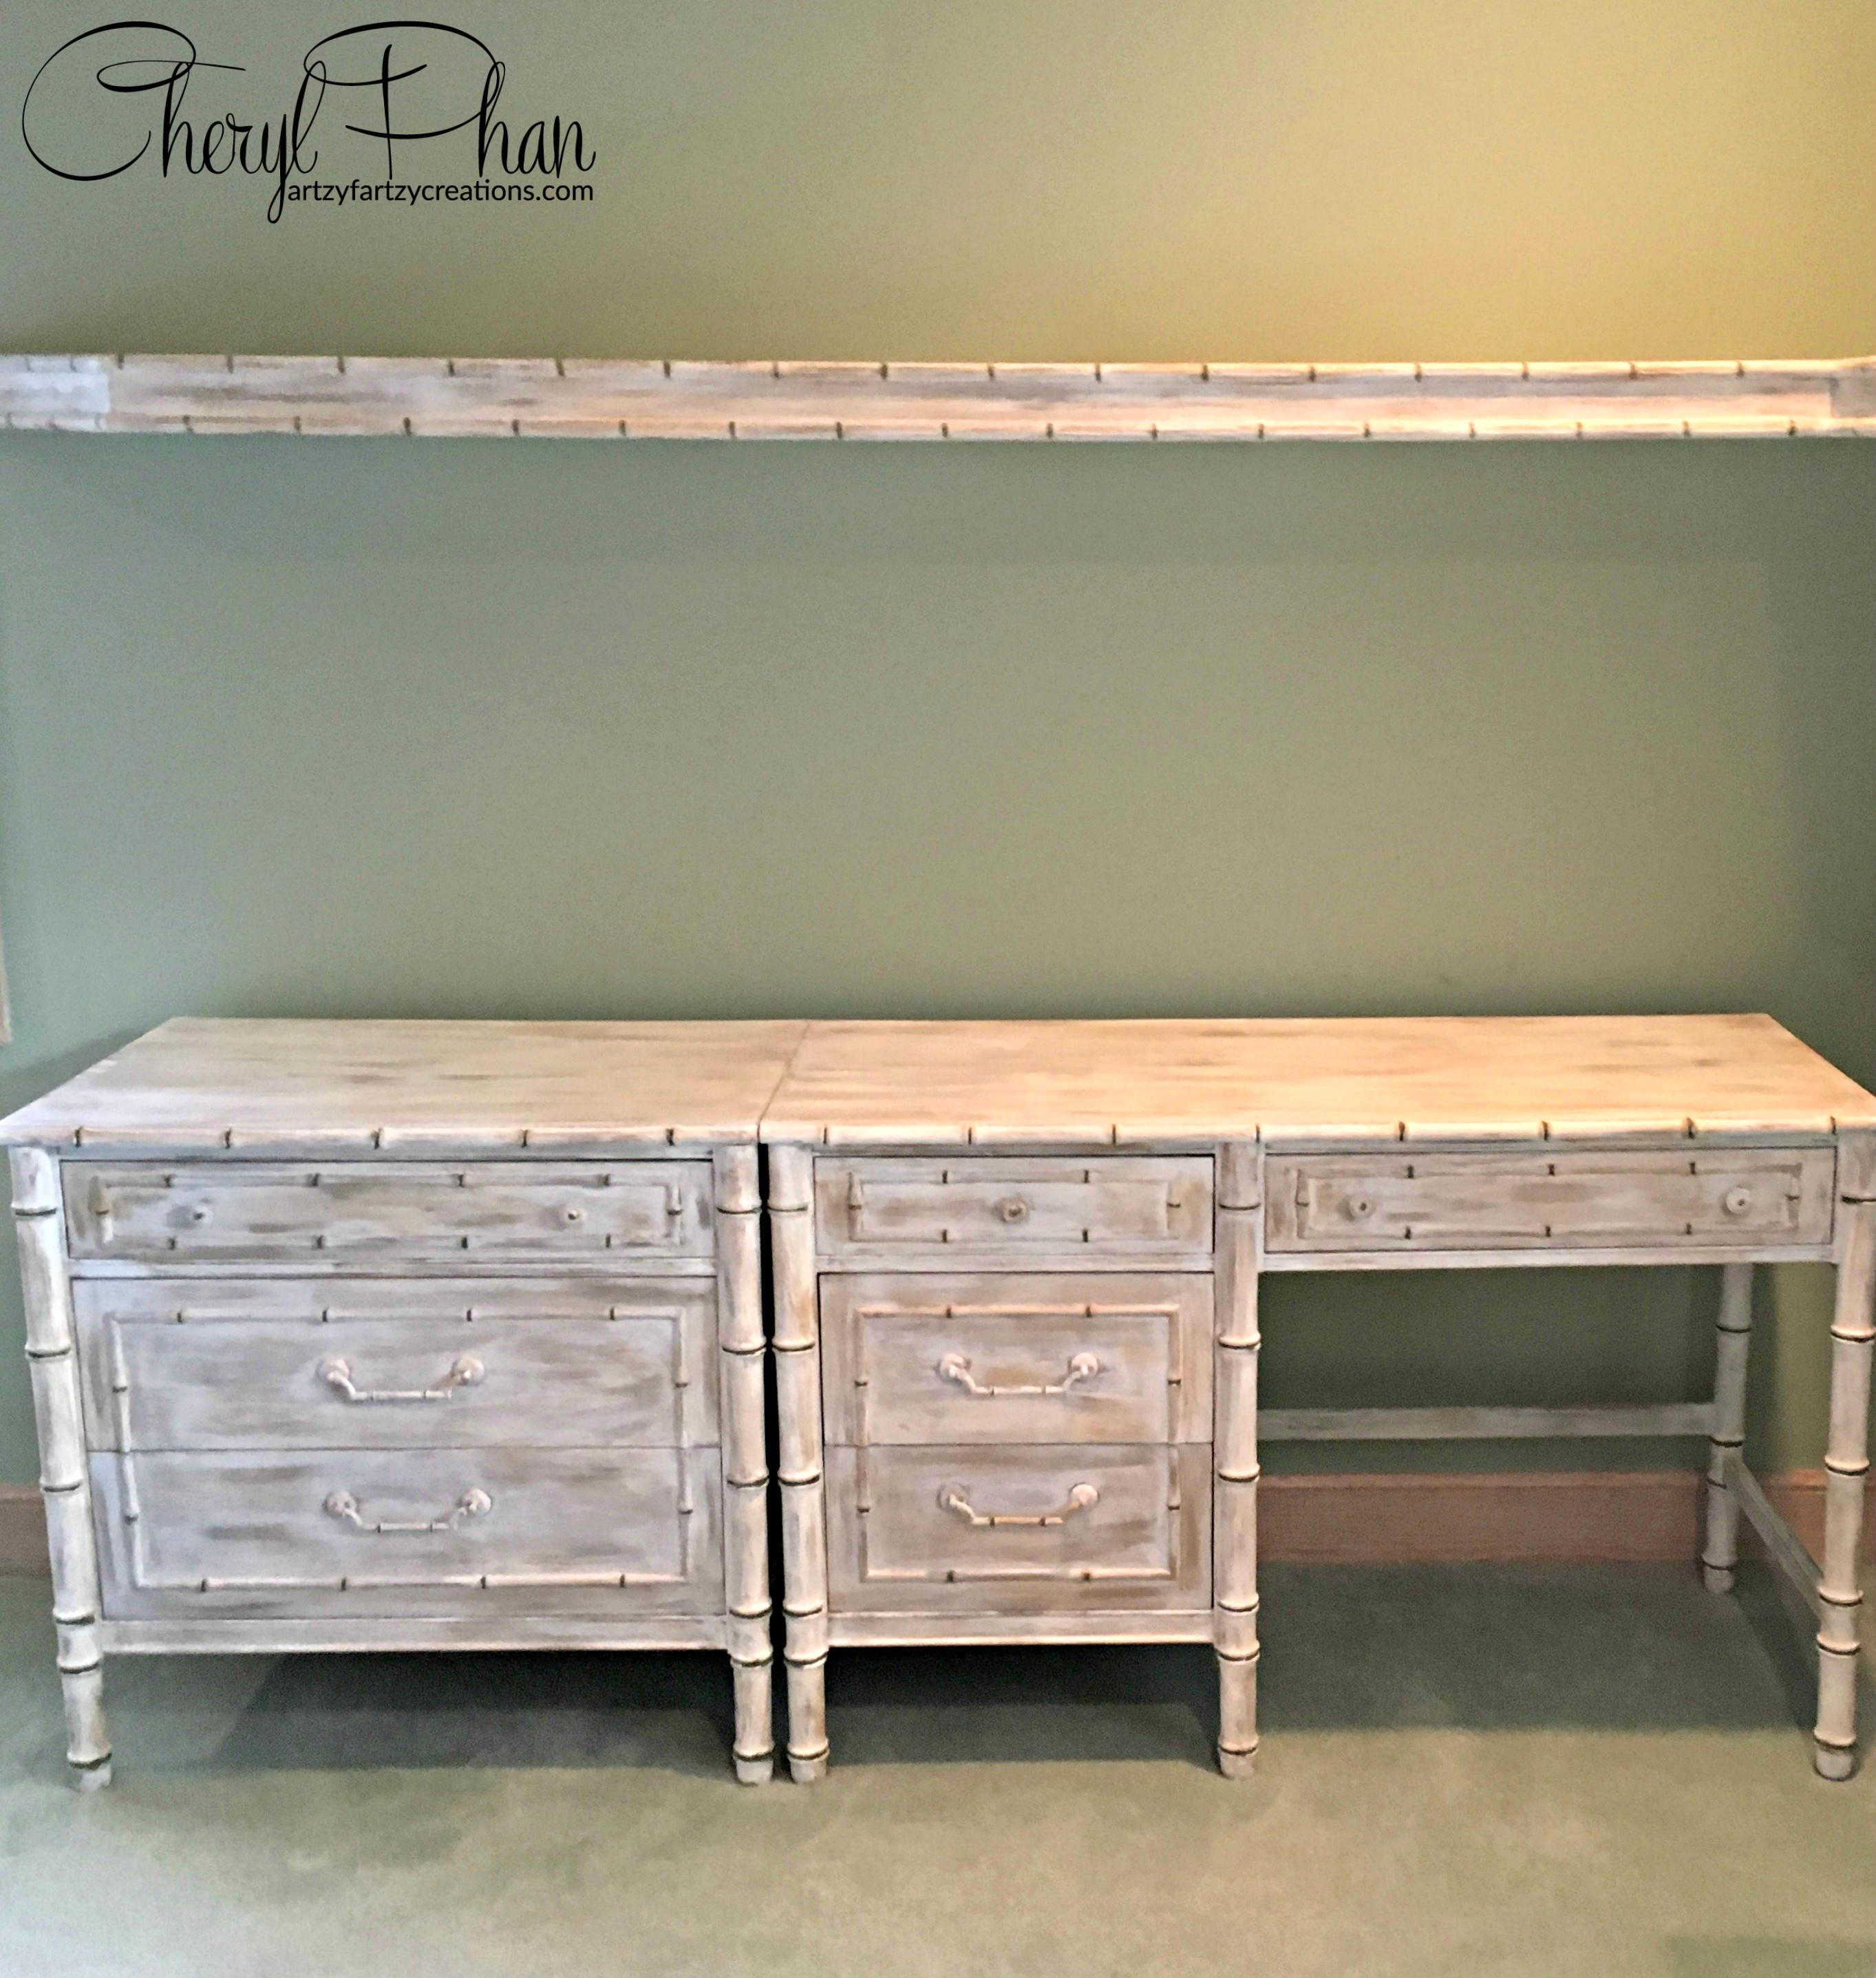 Weathered Furniture Finish - Cheryl Phan